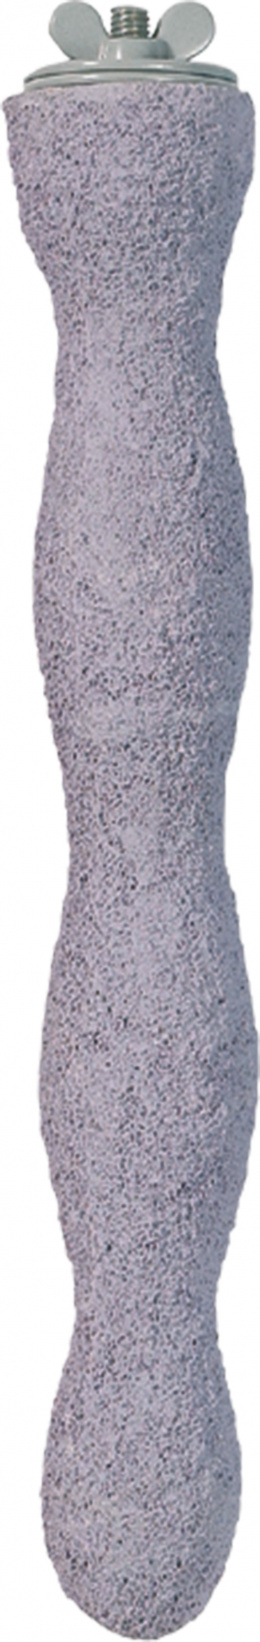 Bidýlko cement 34cm